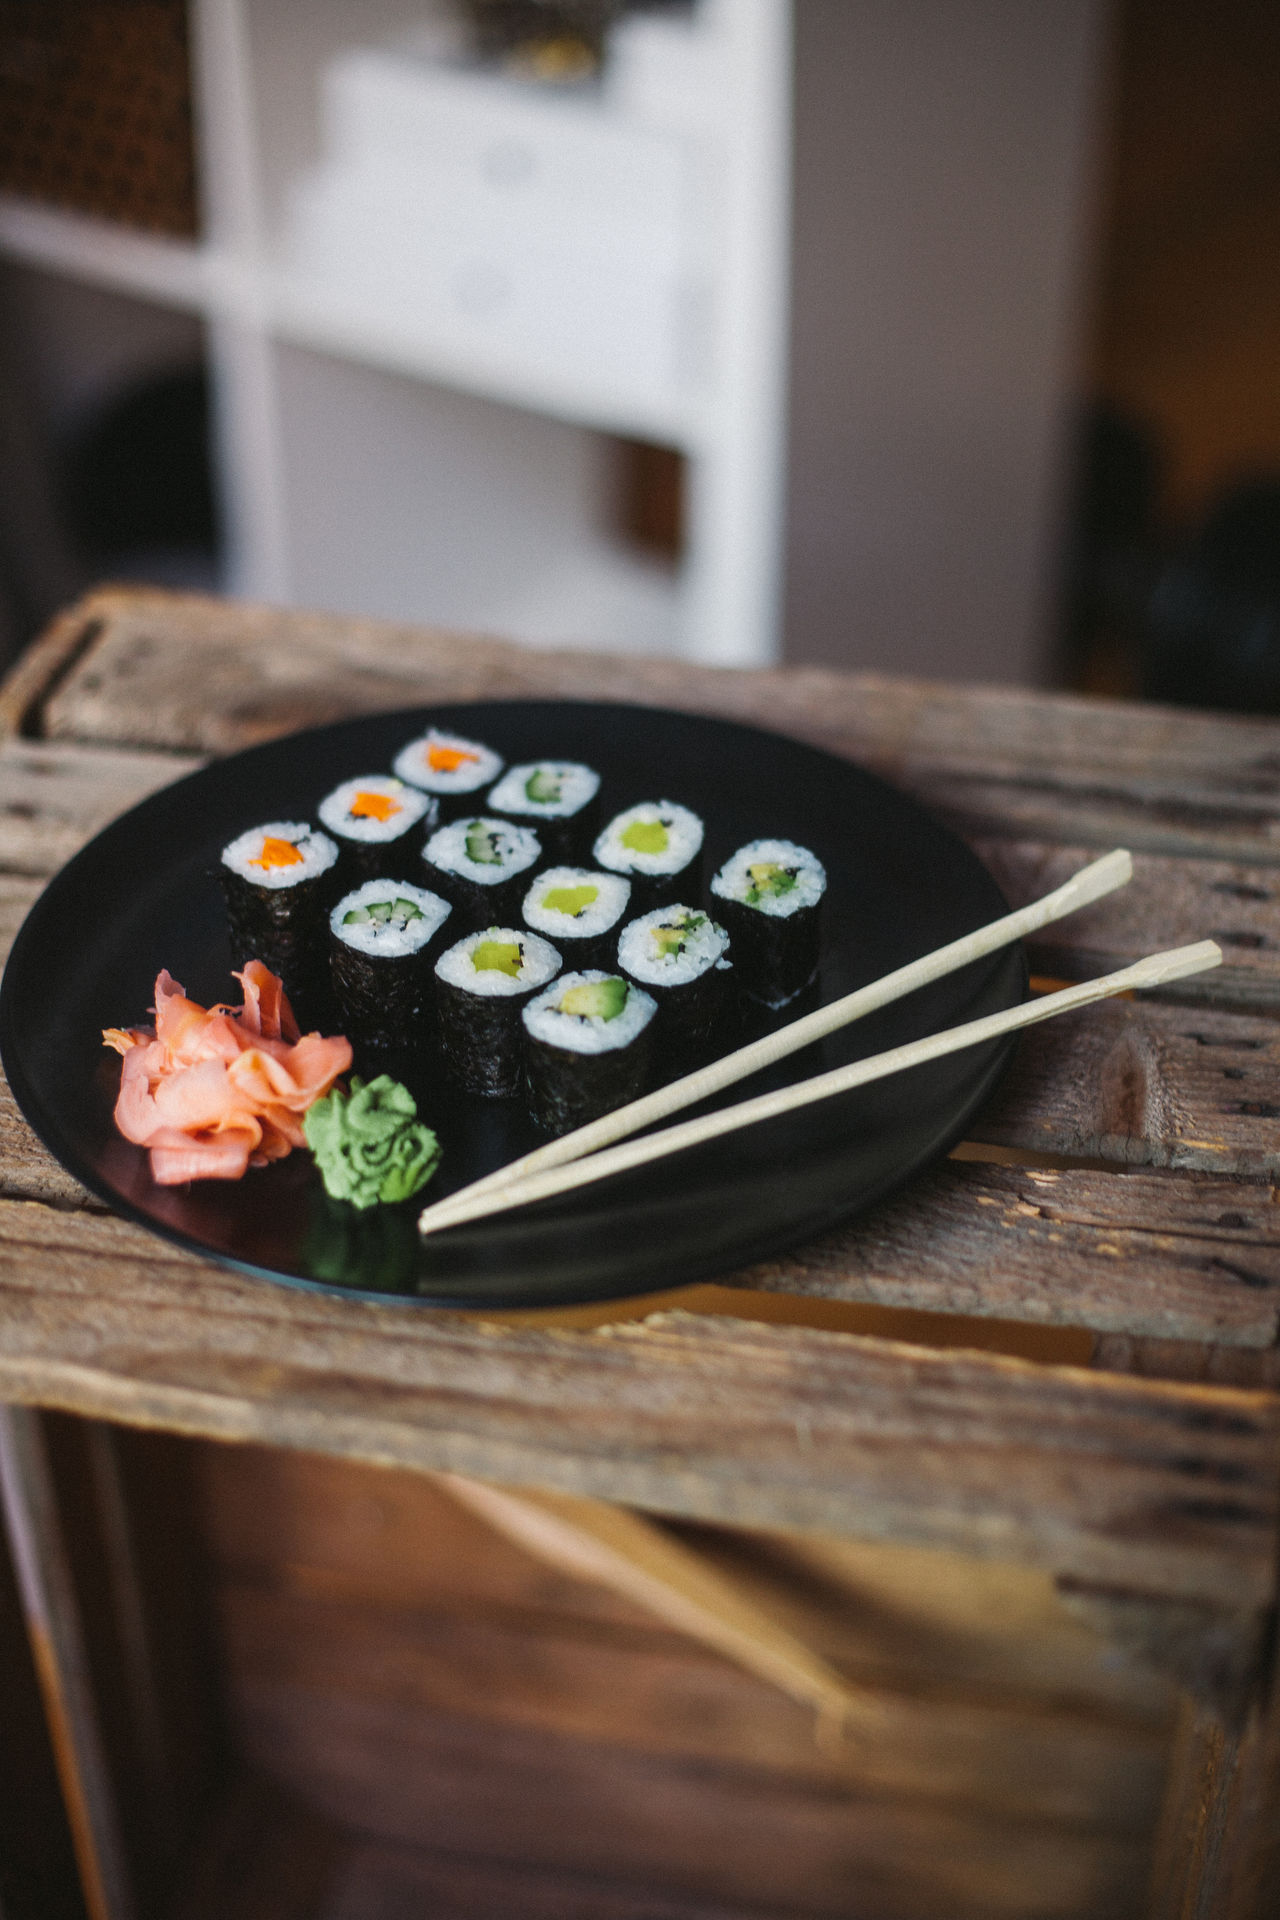 Japanese Food Lunch Sushi Sushi Time Sushilover Vegan Vegan Food Vegetarian Food Wooden Table Fresh On Market 2017